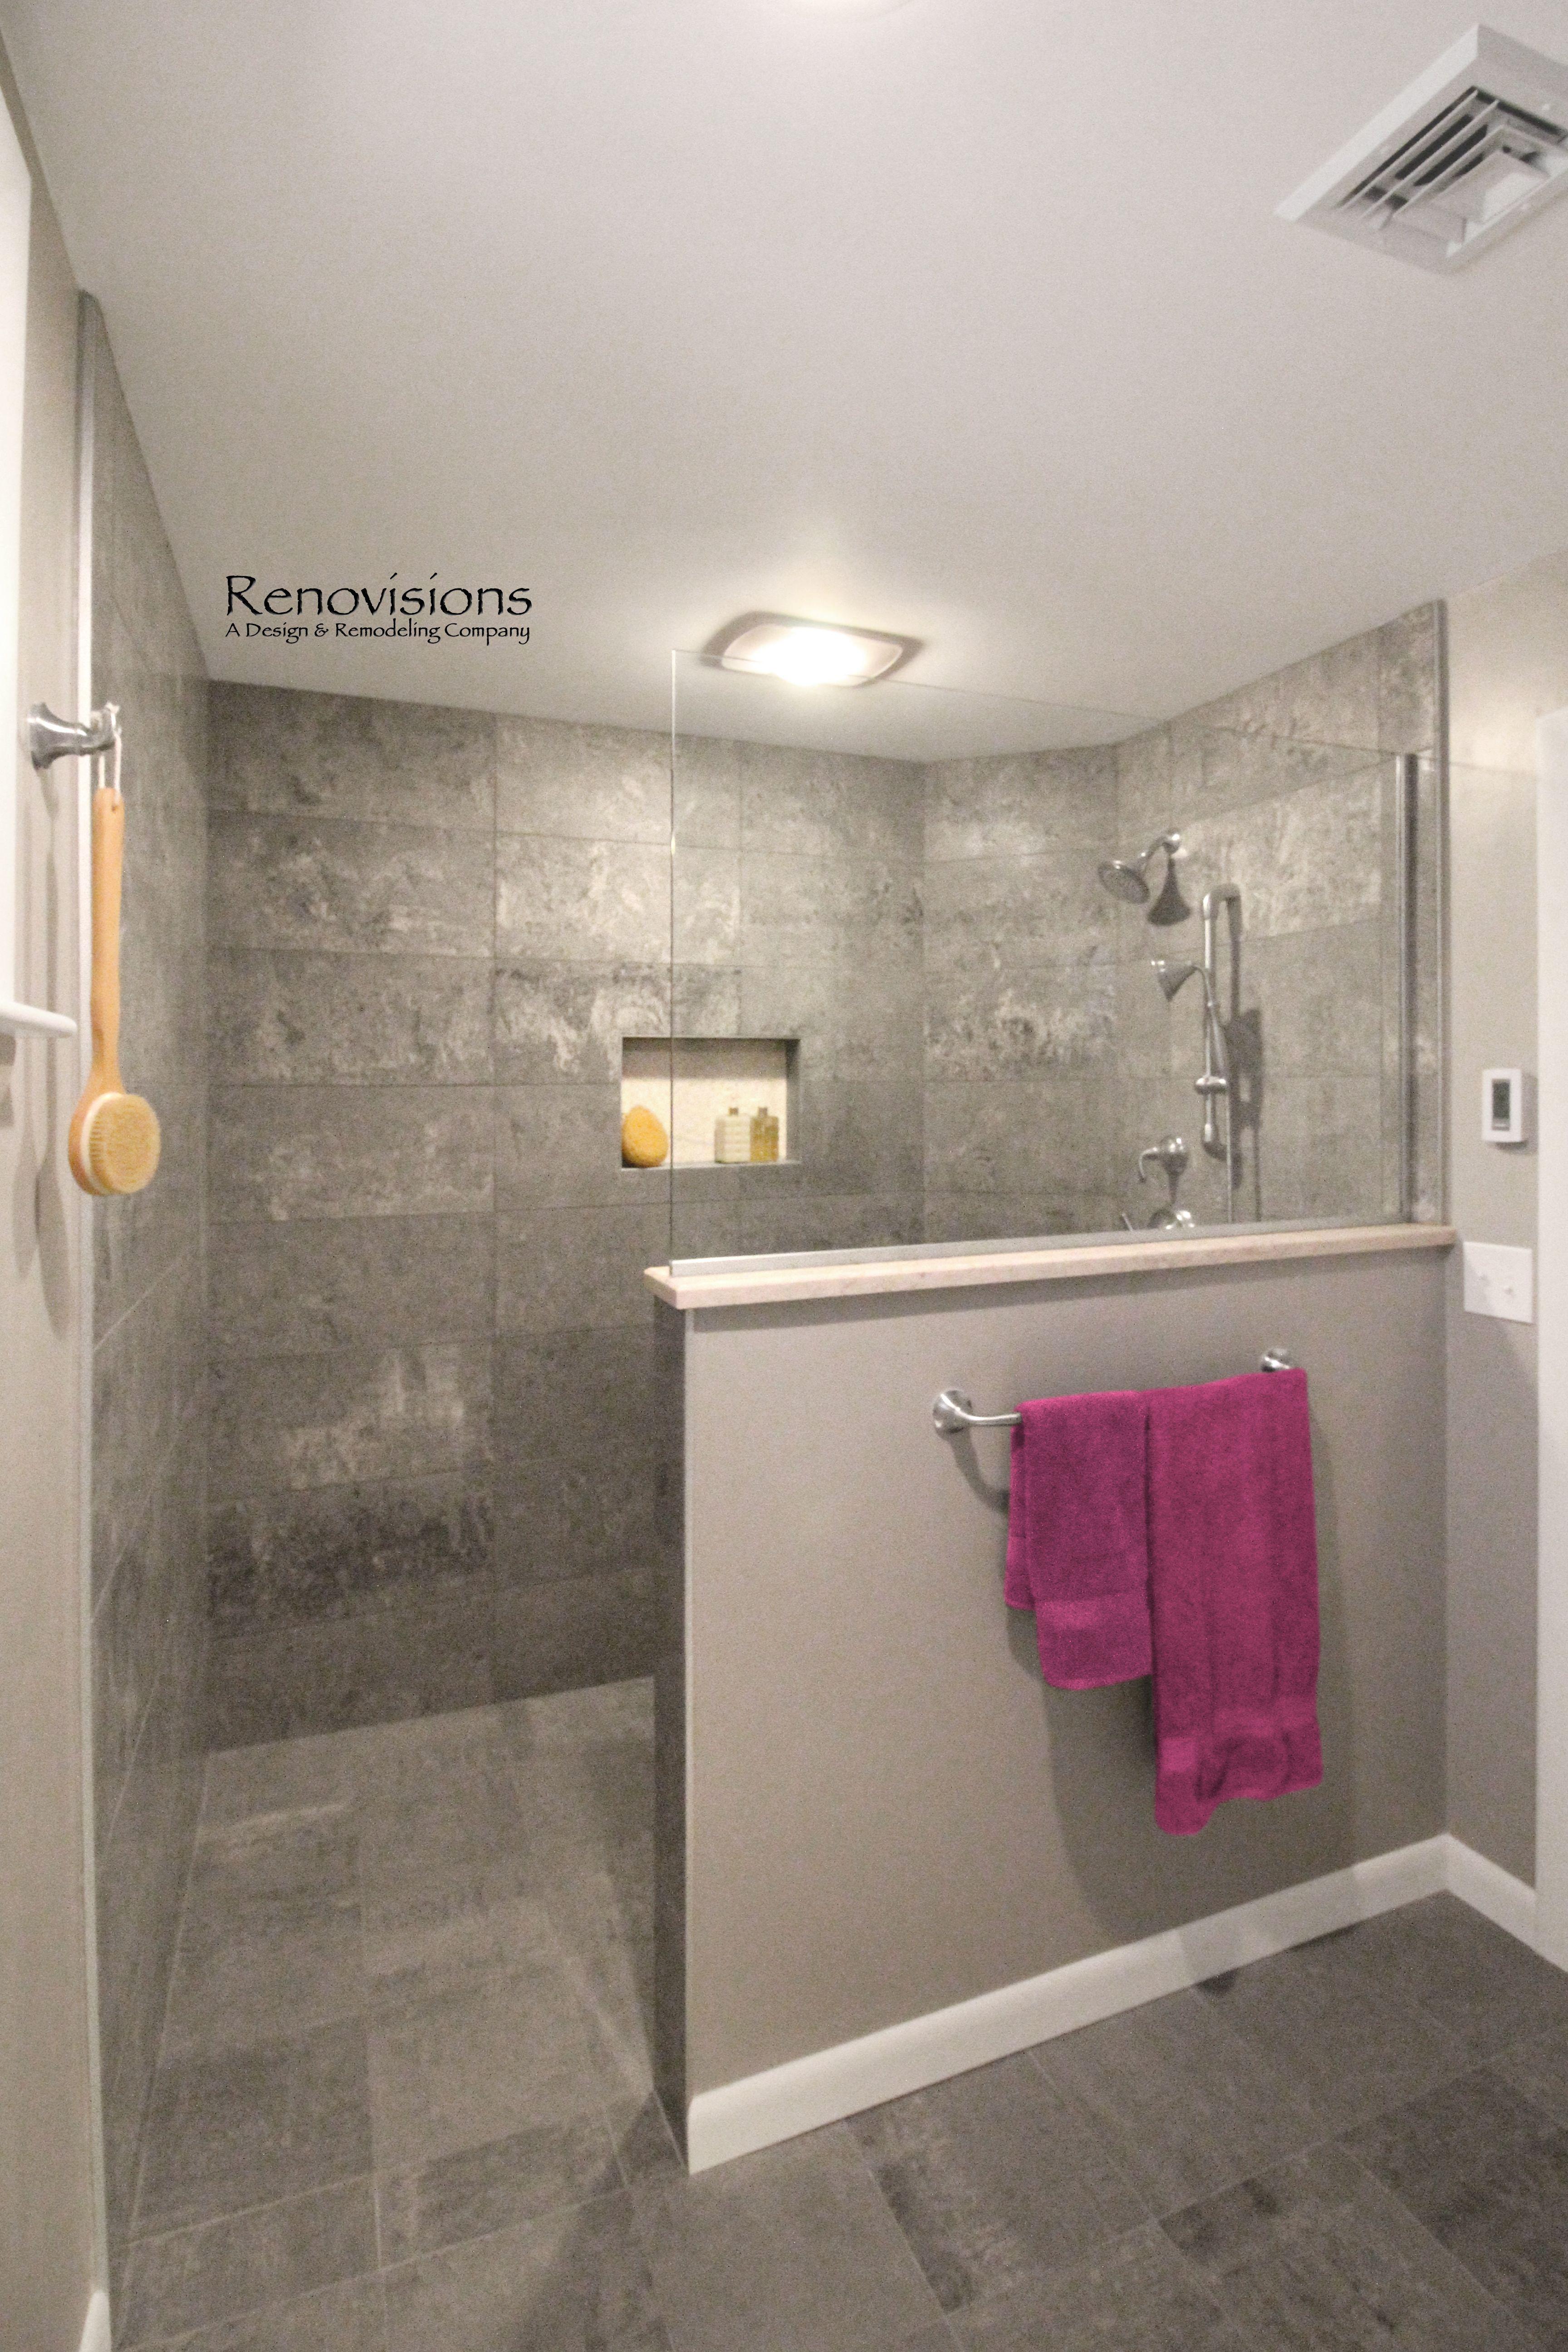 47 Beautiful Ideas Remodel Bathroom Shower Several Steps Should